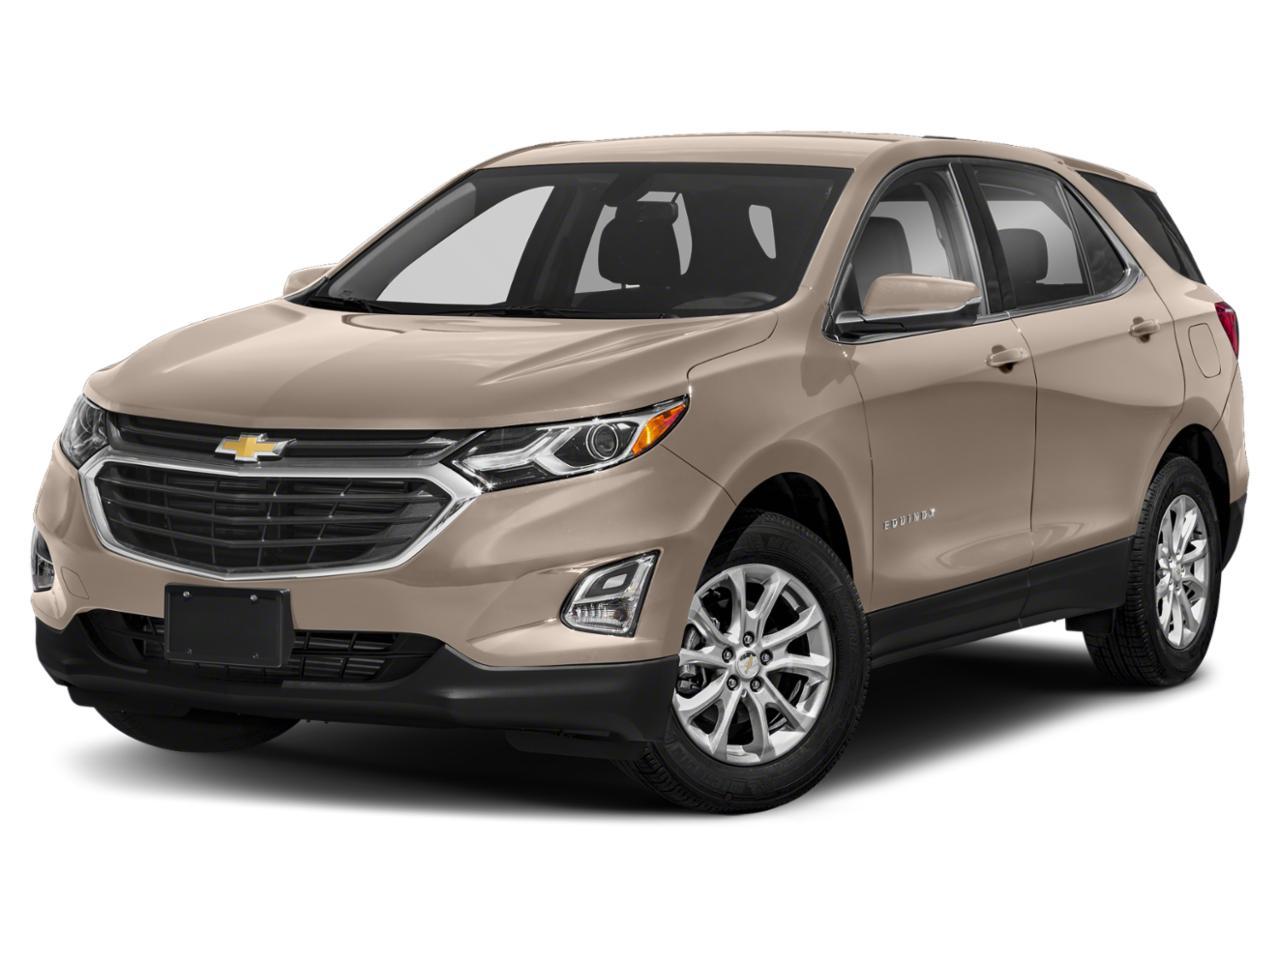 2018 Chevrolet Equinox Vehicle Photo in Chickasha, OK 73018